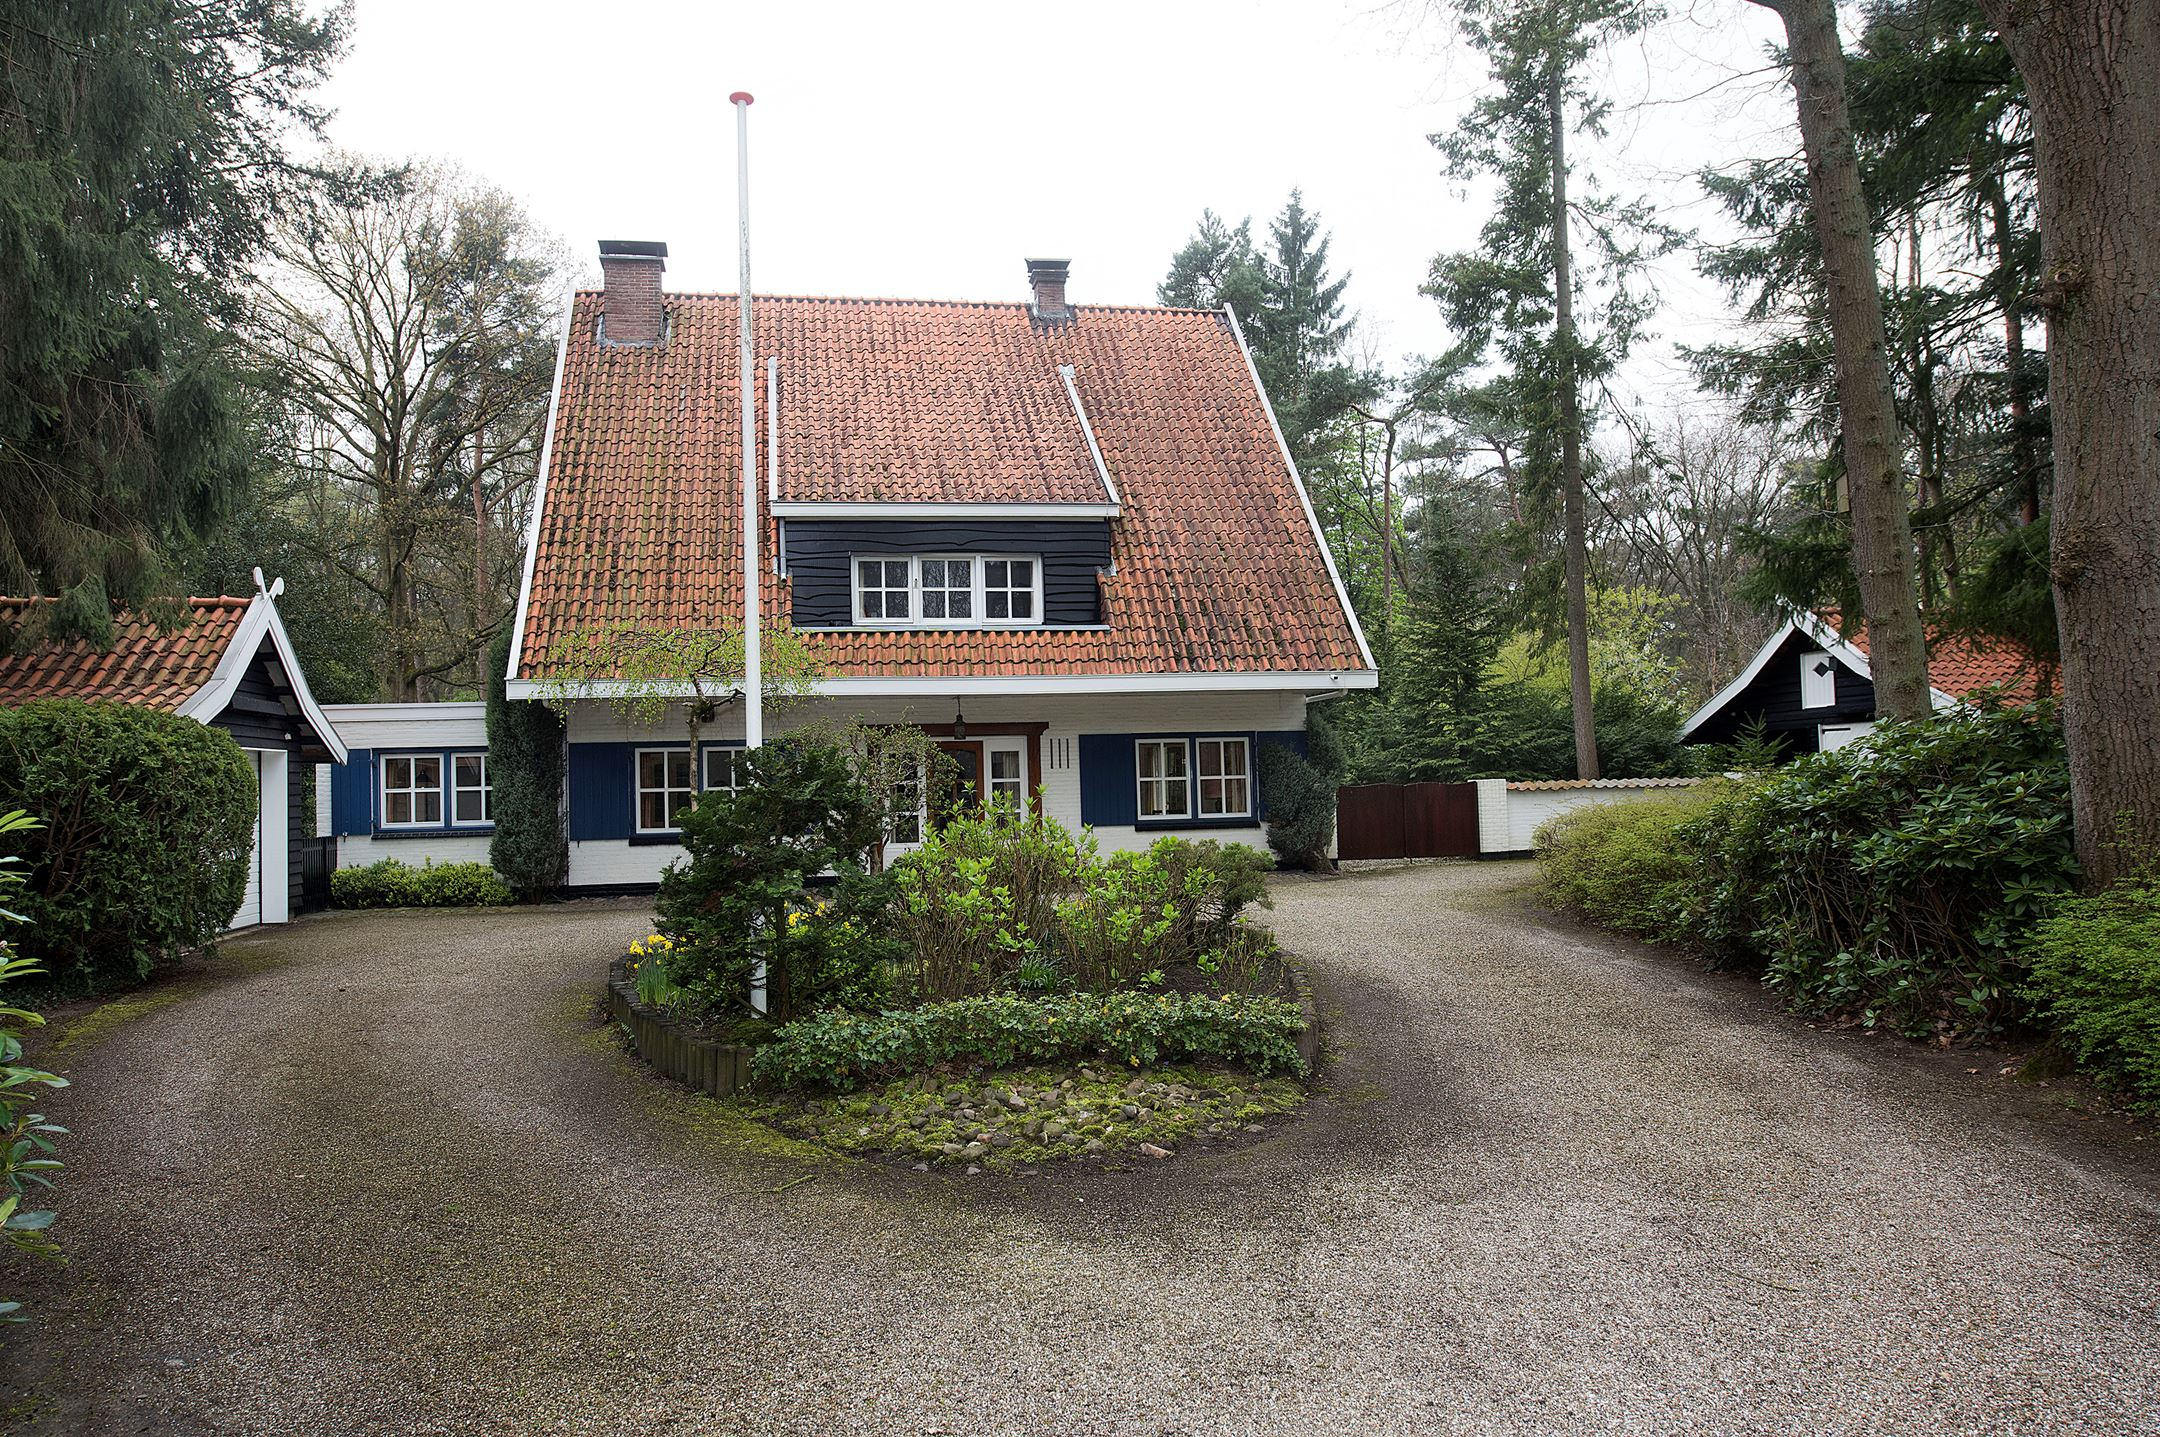 Huis te koop oude deldenerweg 219 7548 pm enschede funda for Funda woonboerderij twente